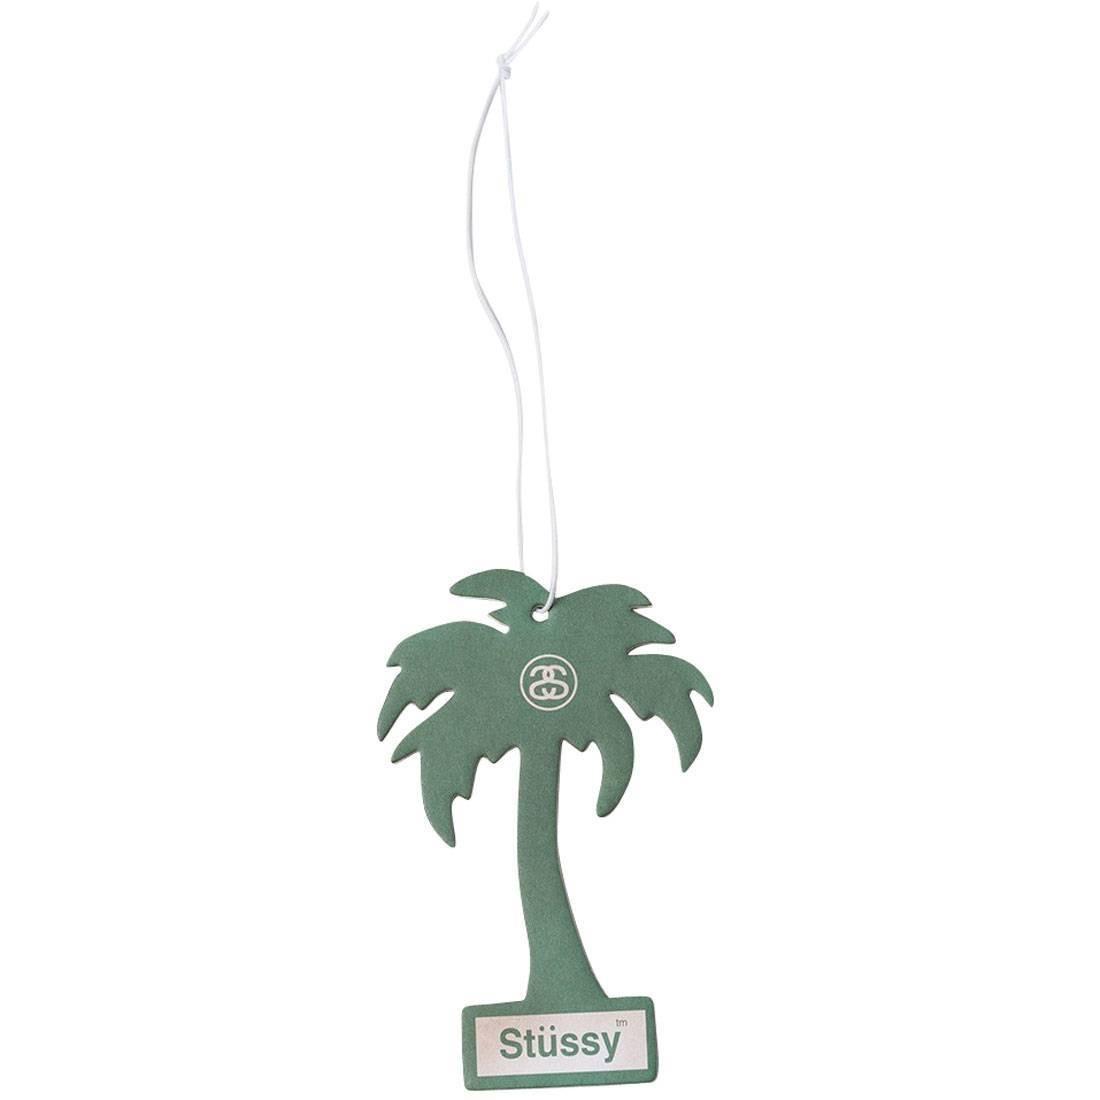 stussy wallpaper palm trees - photo #33